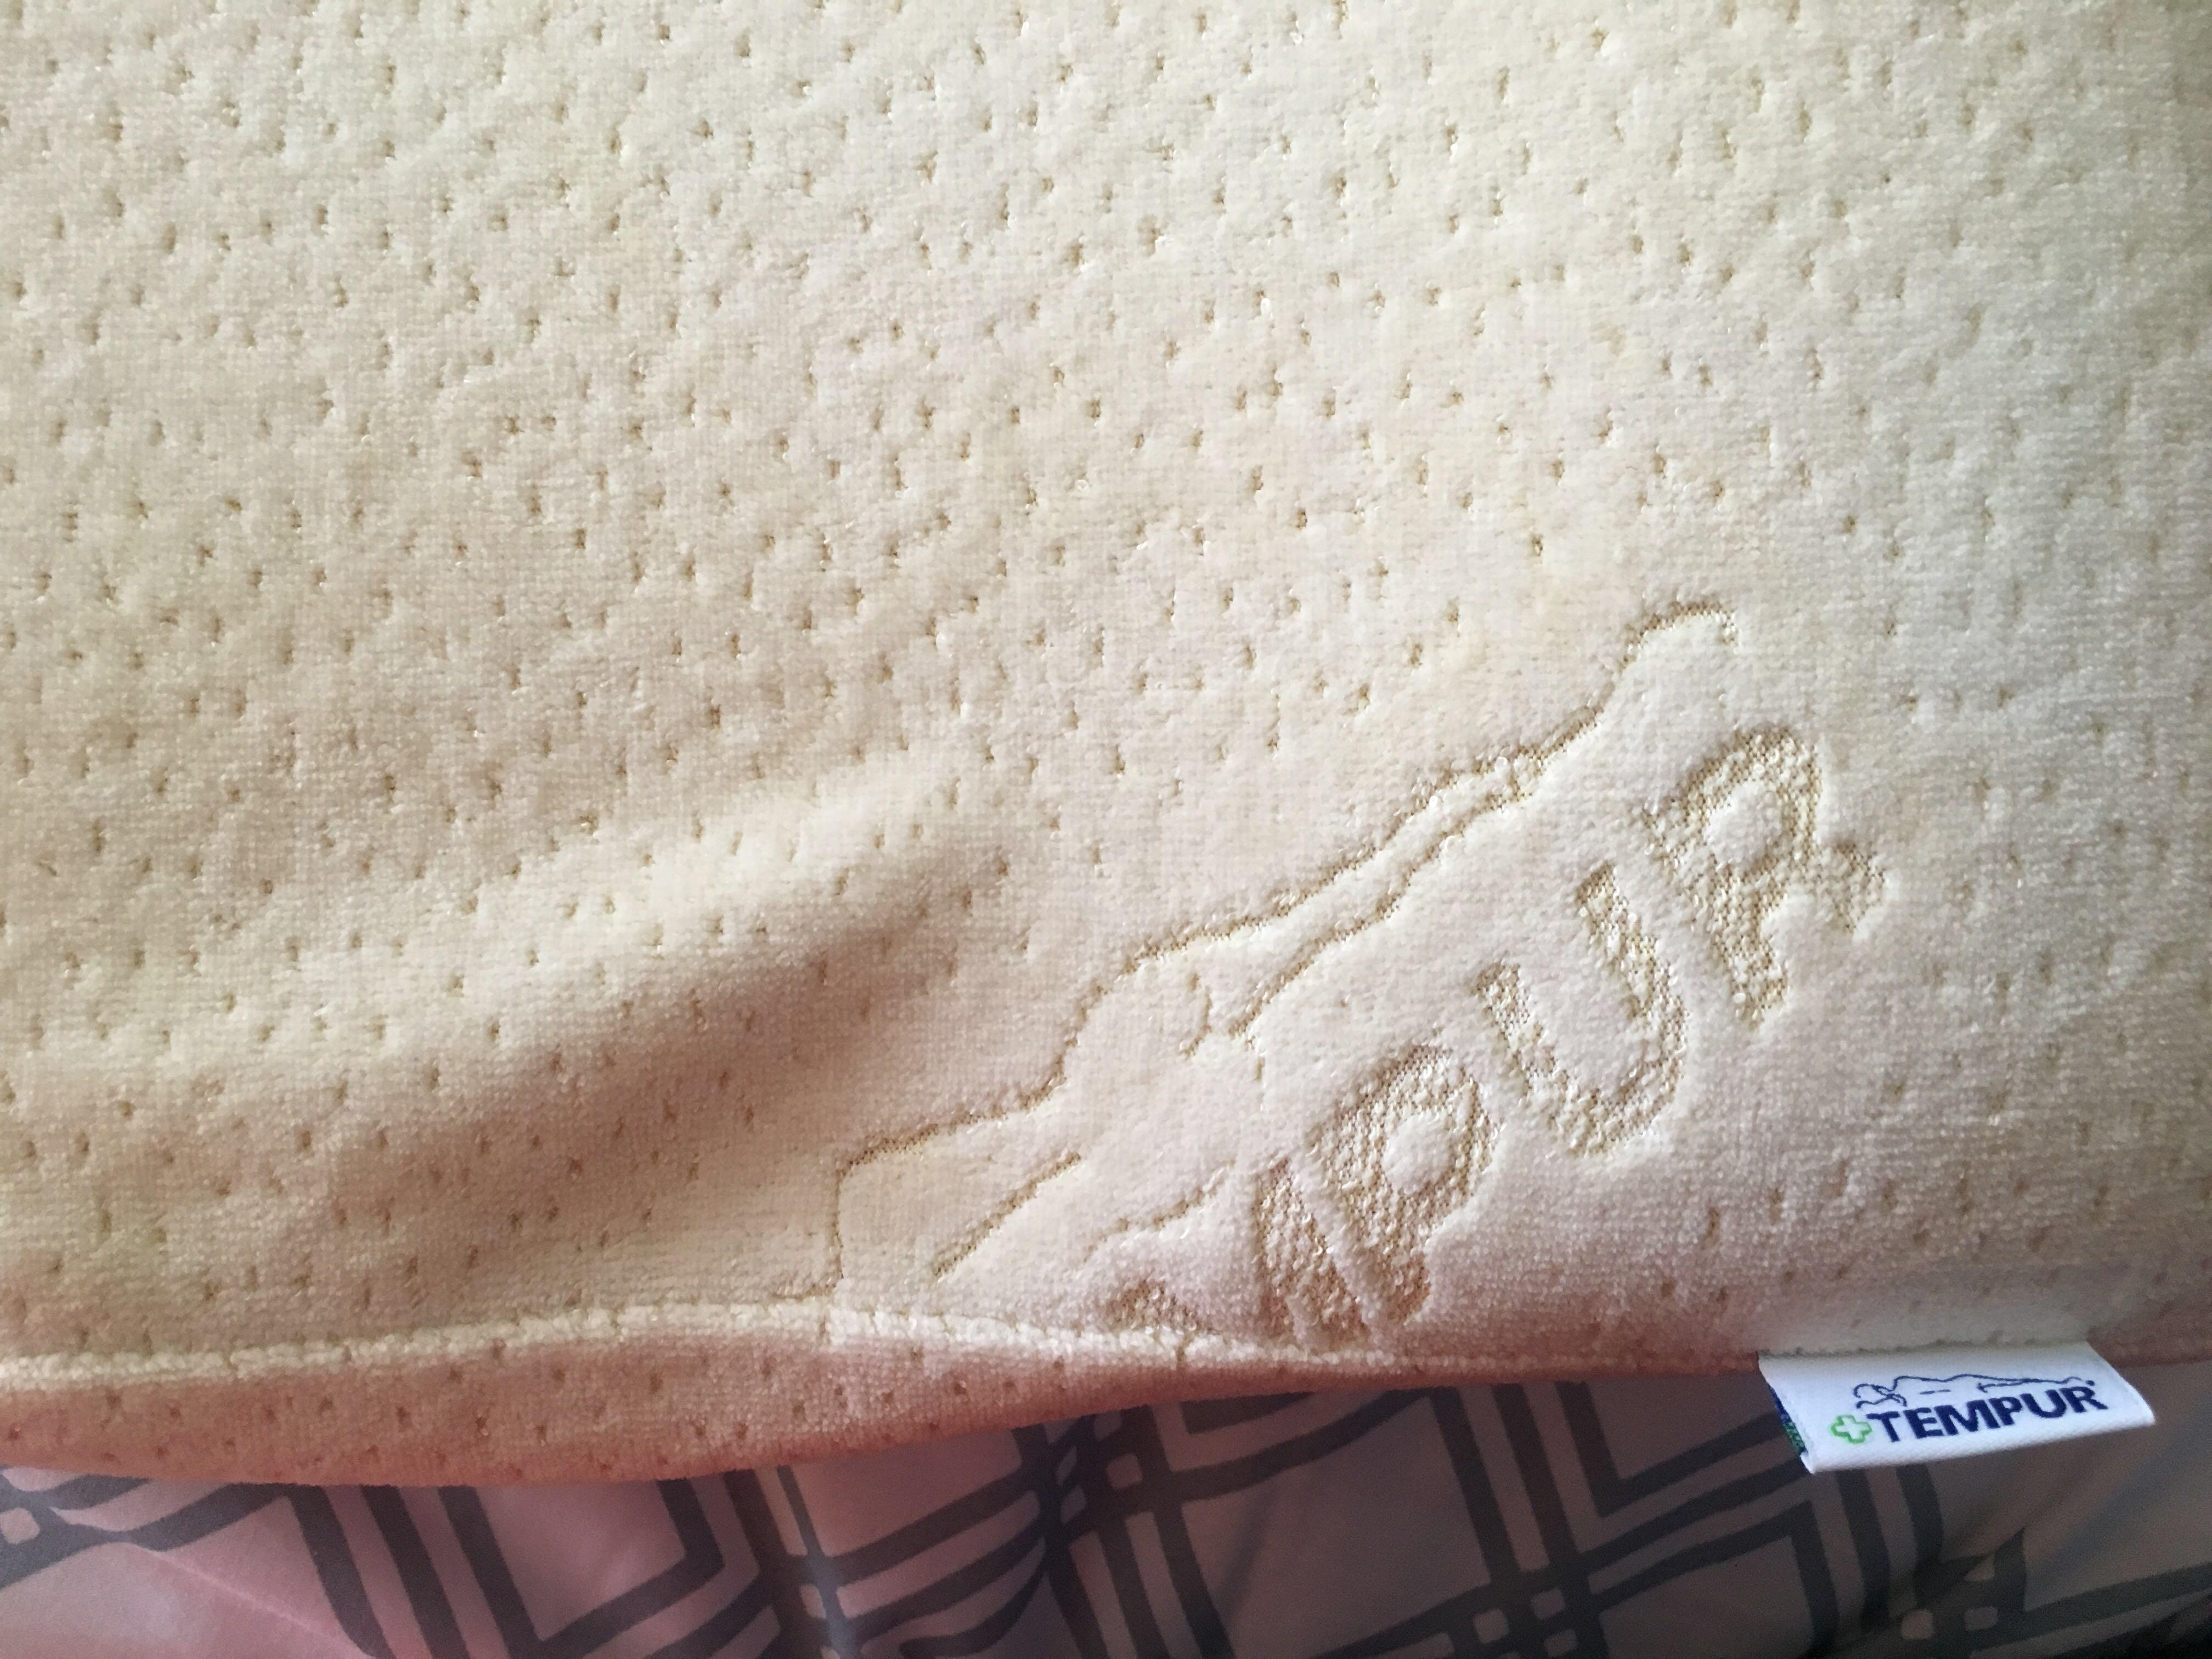 Tempur Large Memory Foam Pillow